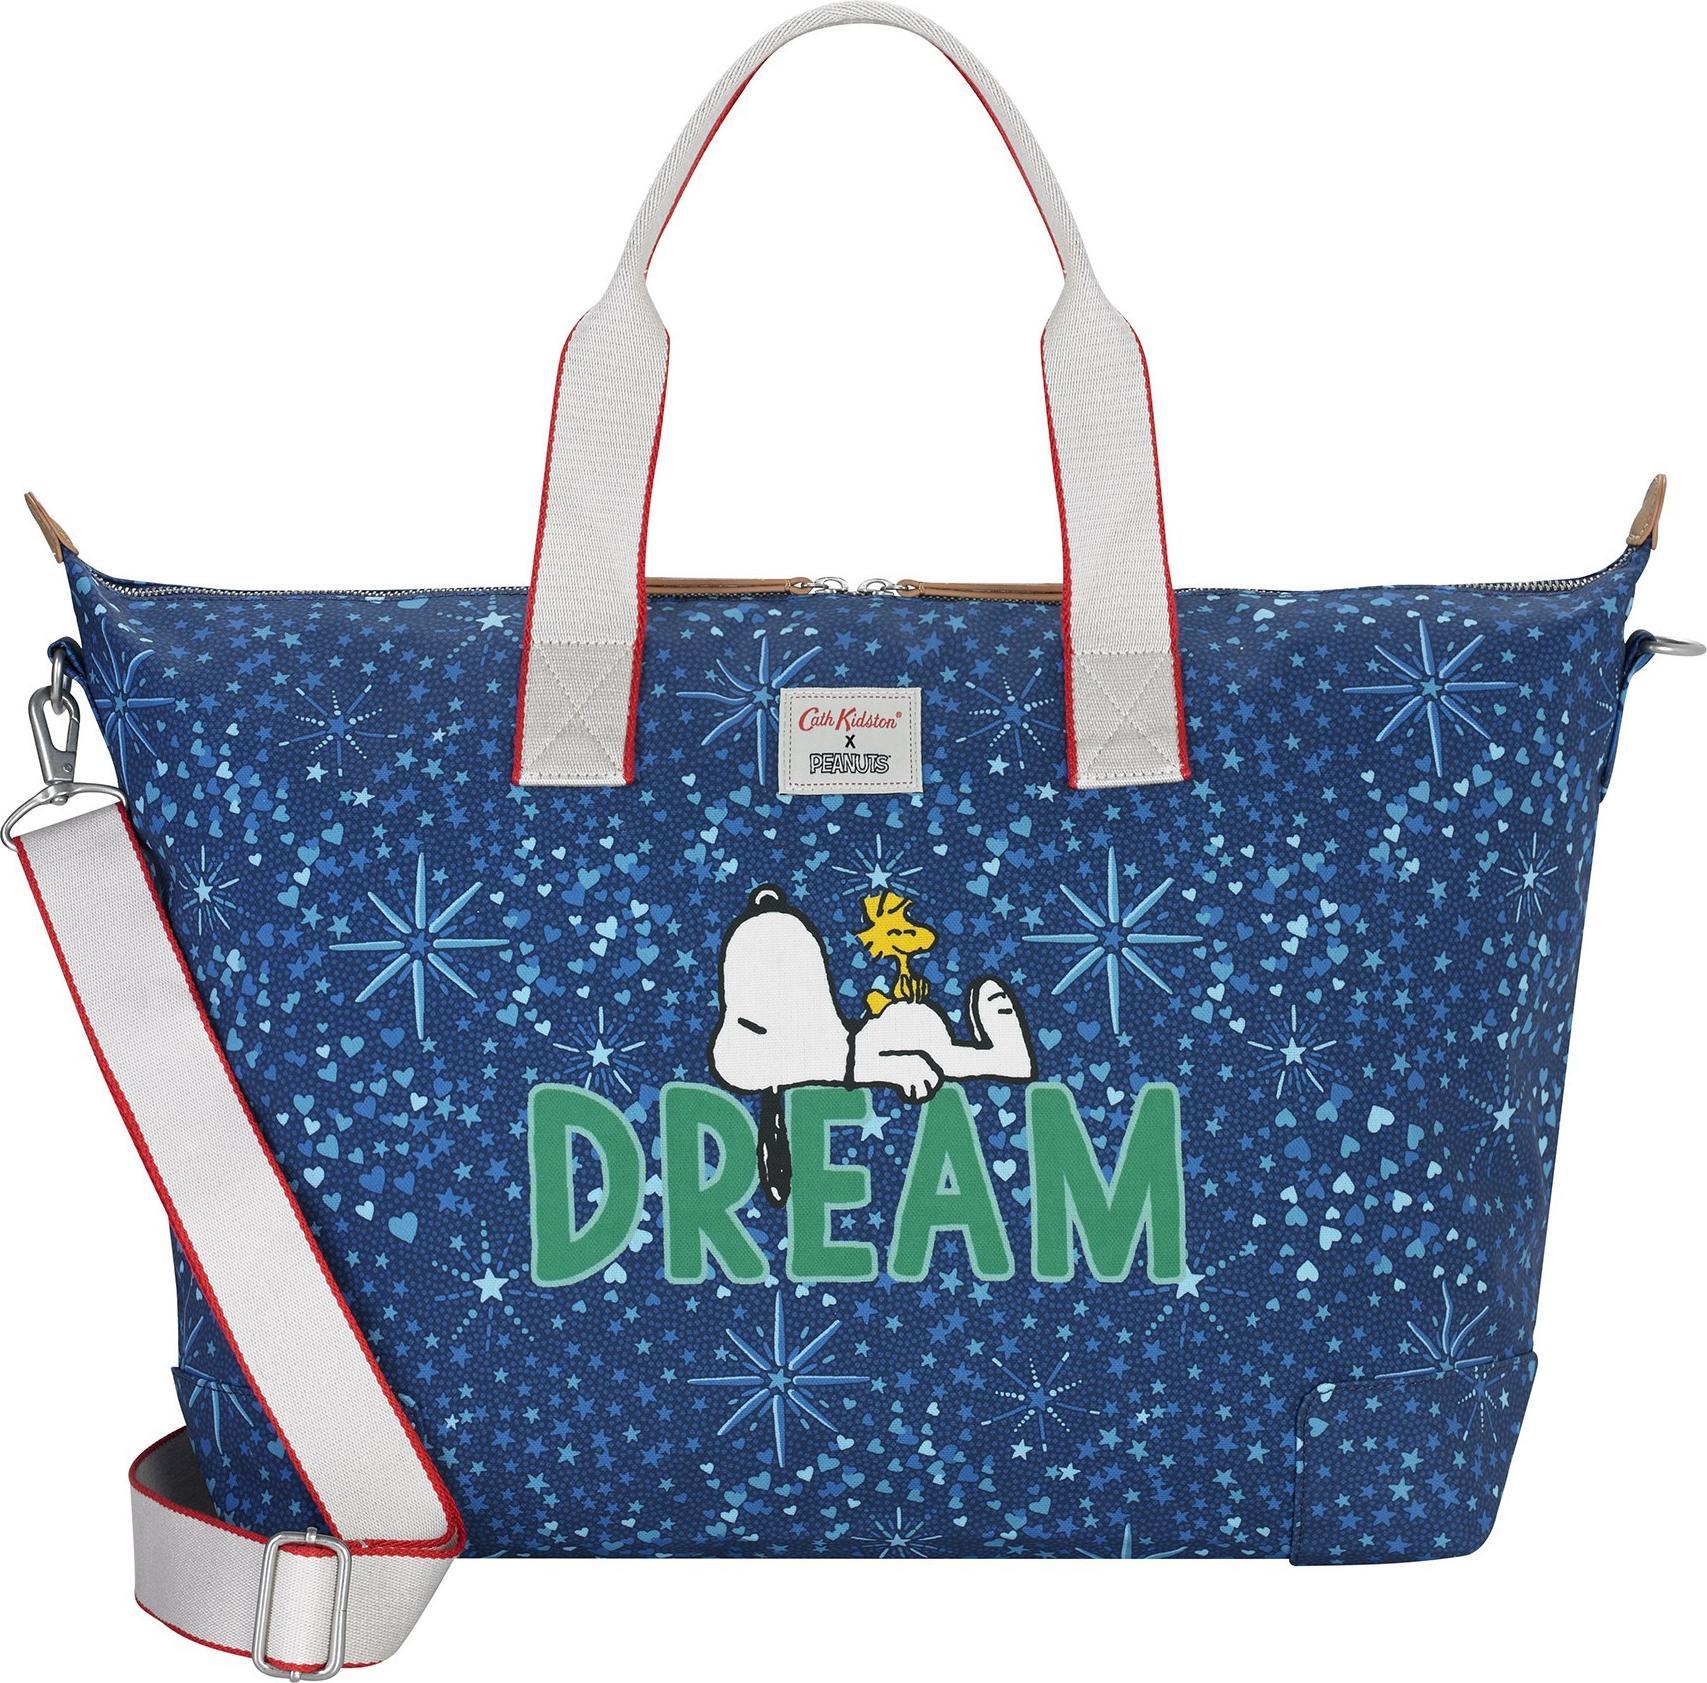 Túi du lịch Cath Kidston họa tiết Dream Midnight Stars PL02 (Snoopy Dream Midnight Stars PL02 Overnight Bag)